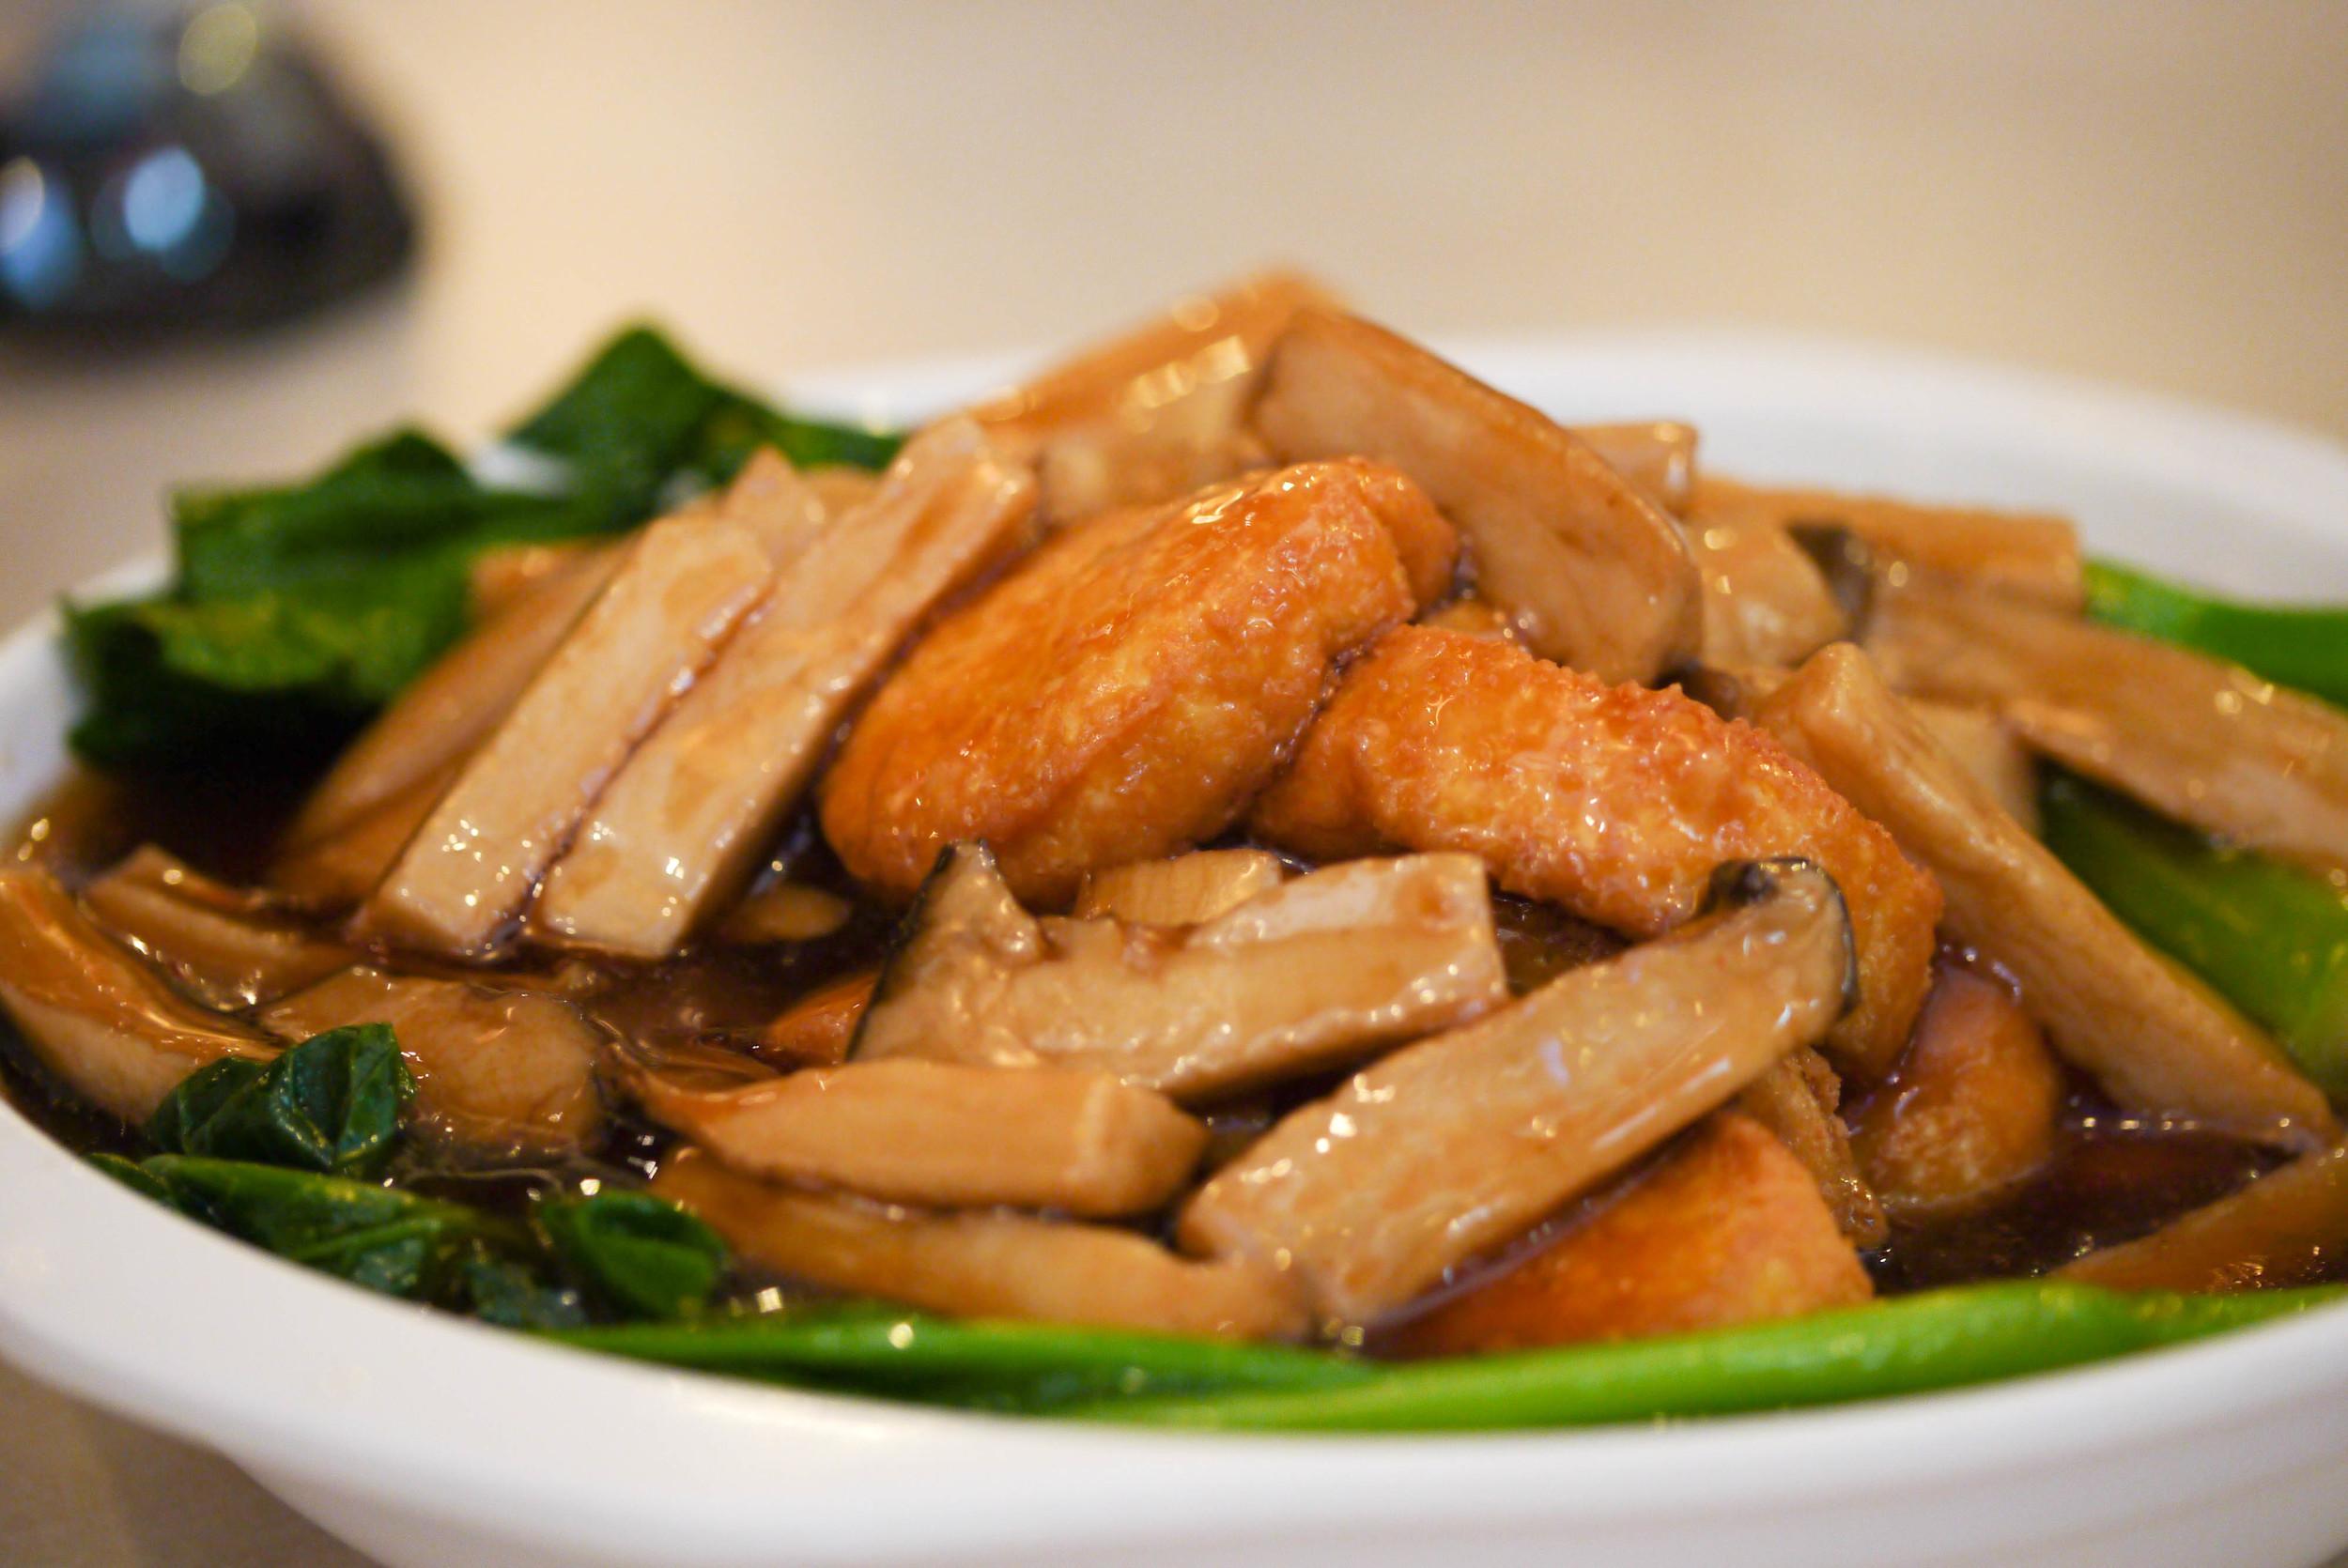 Figure 3. Tofu, mushrooms and Chinese broccoli